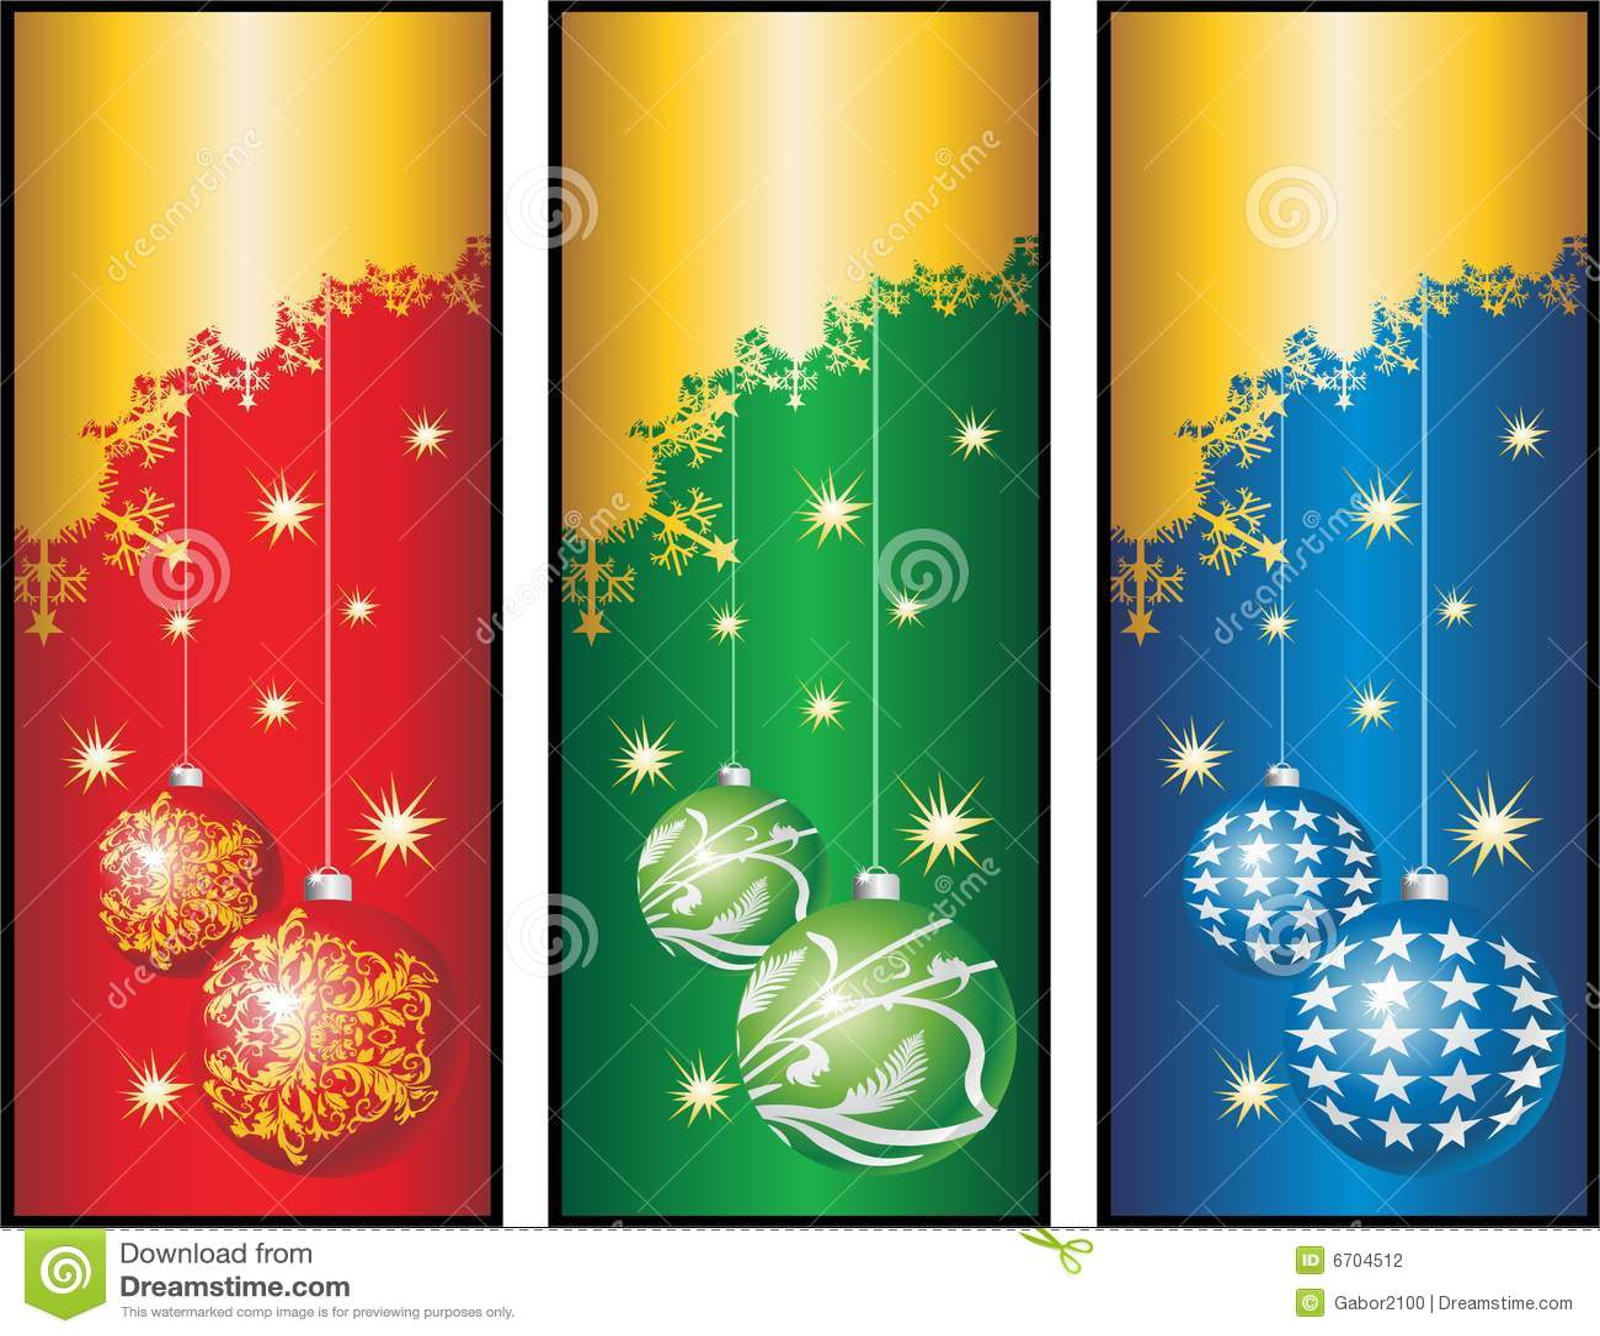 Christmas Bannerscdr Stock Photography Image 6704512